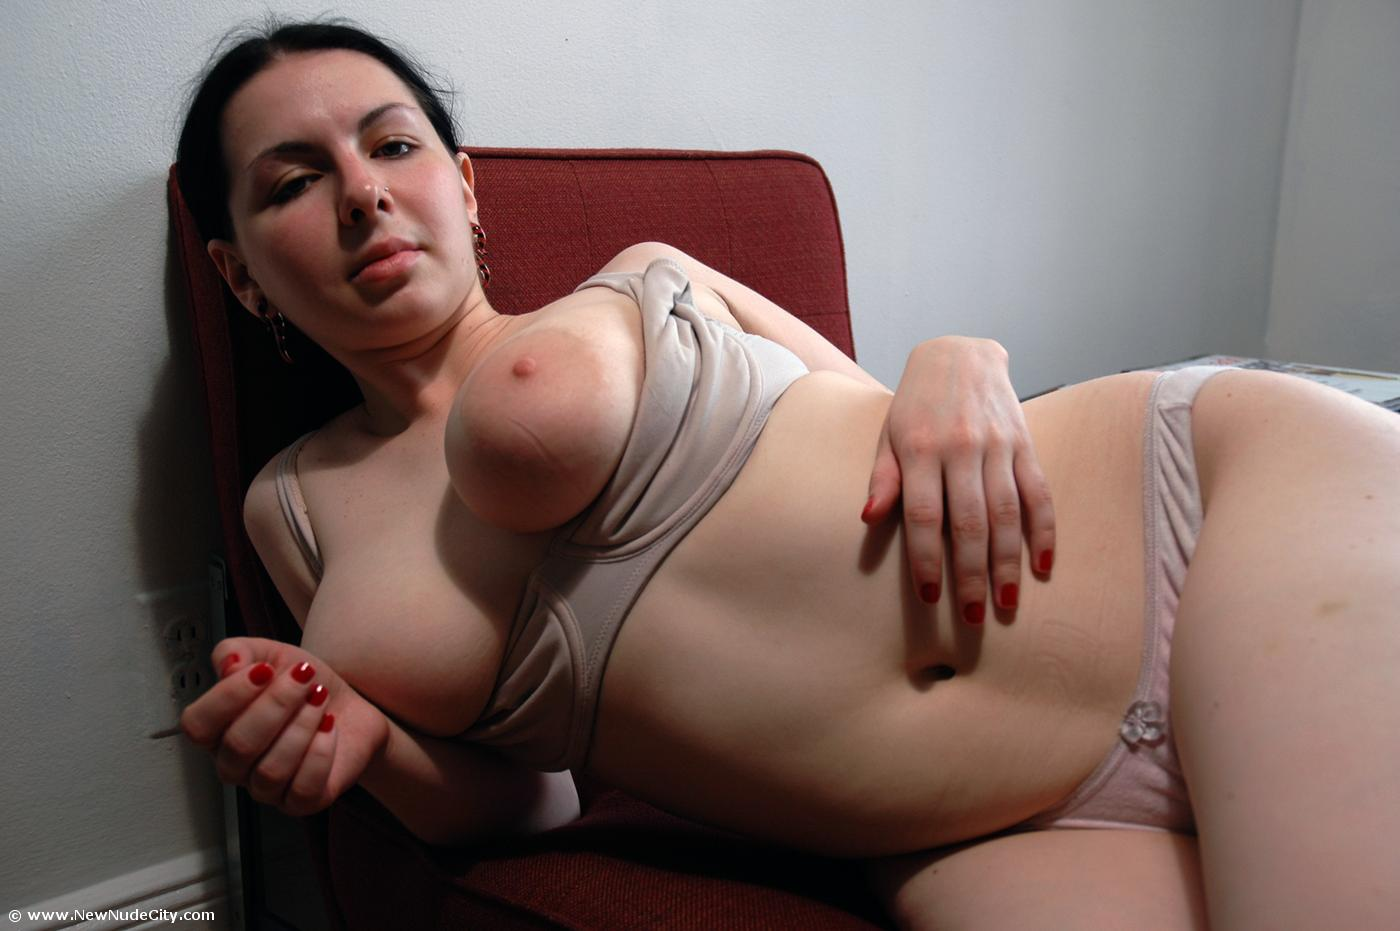 Beautiful mature women stockings